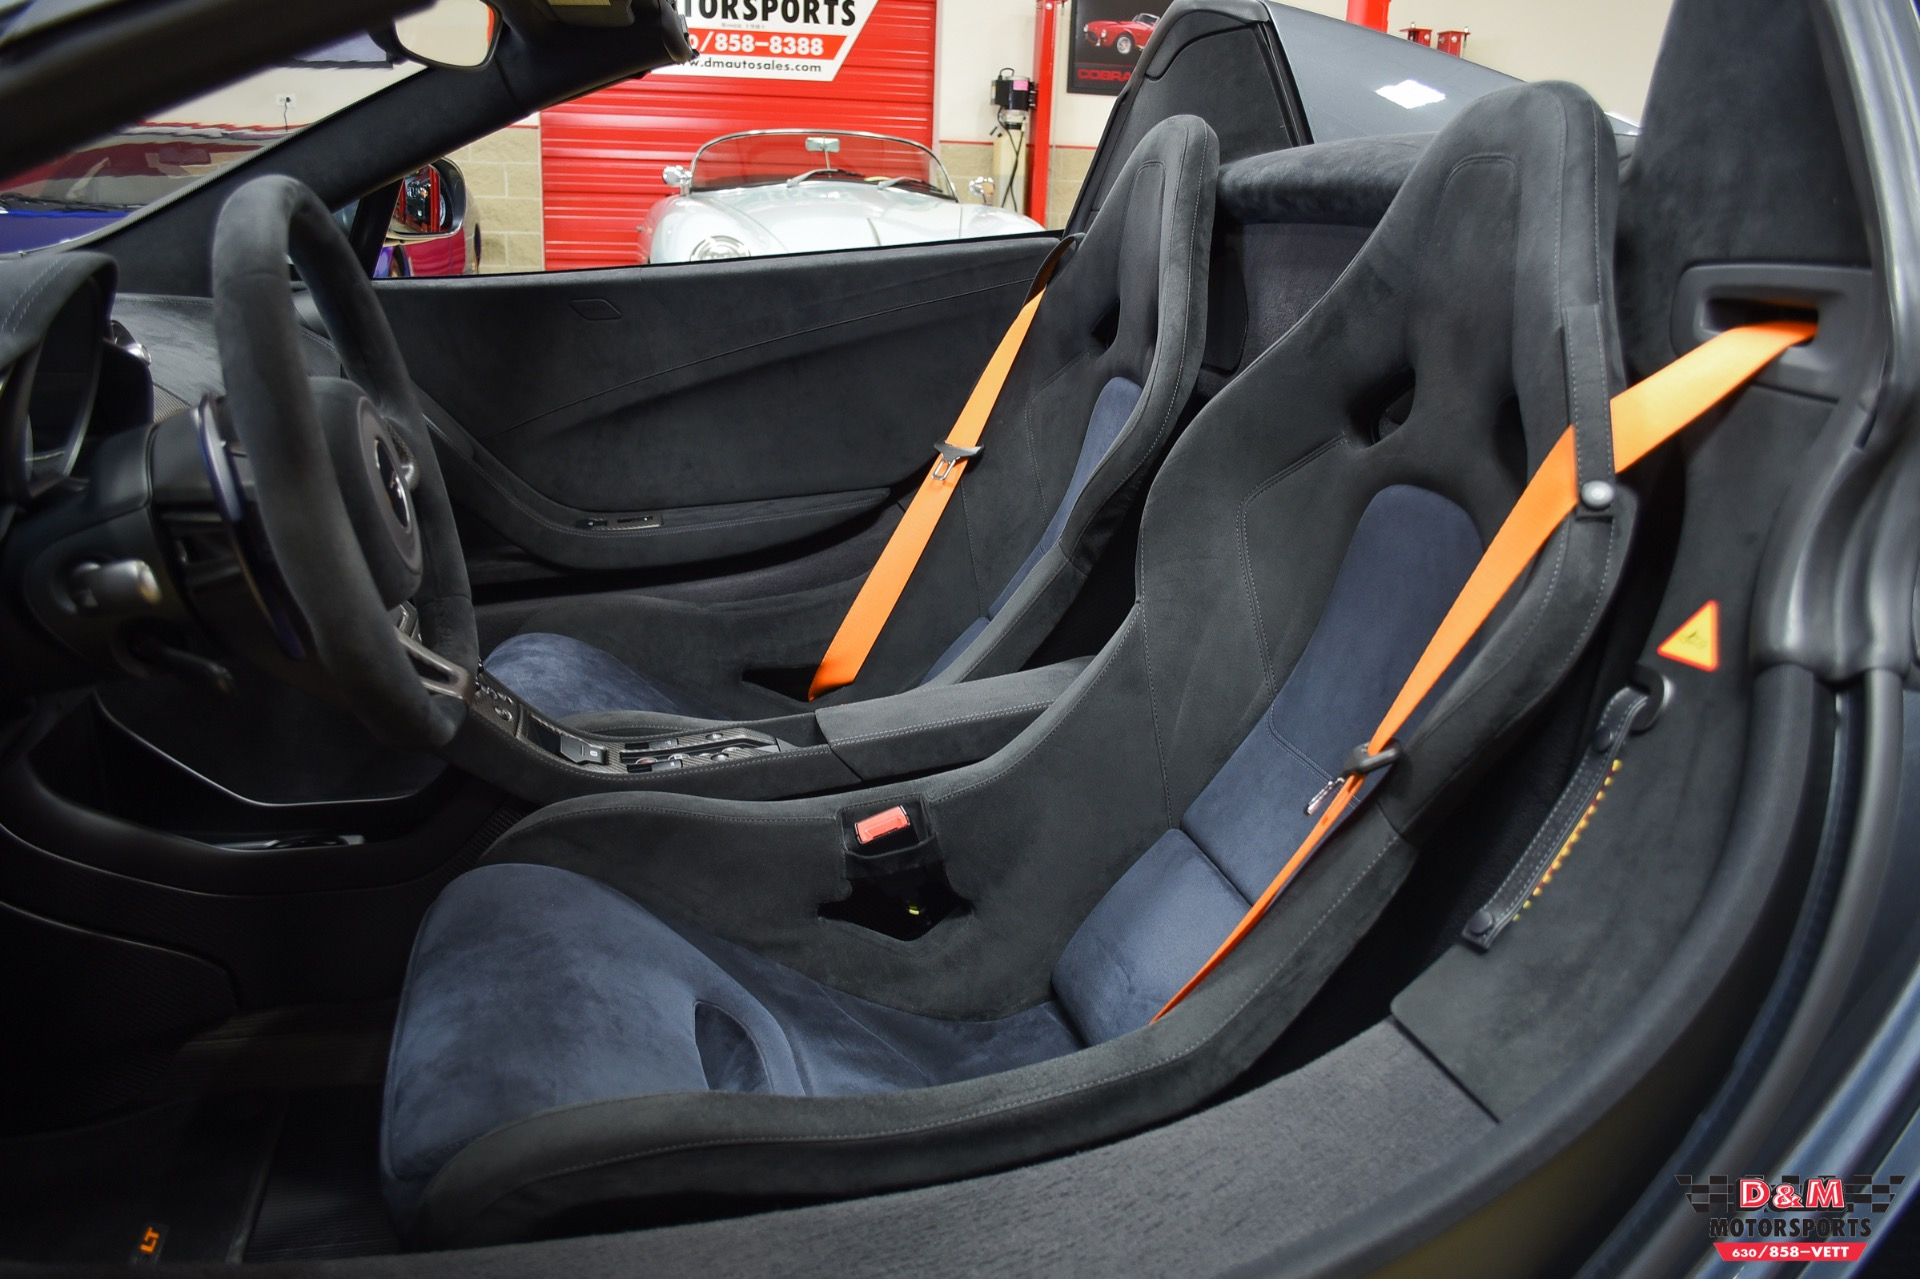 Used 2016 McLaren 675LT Spider | Glen Ellyn, IL